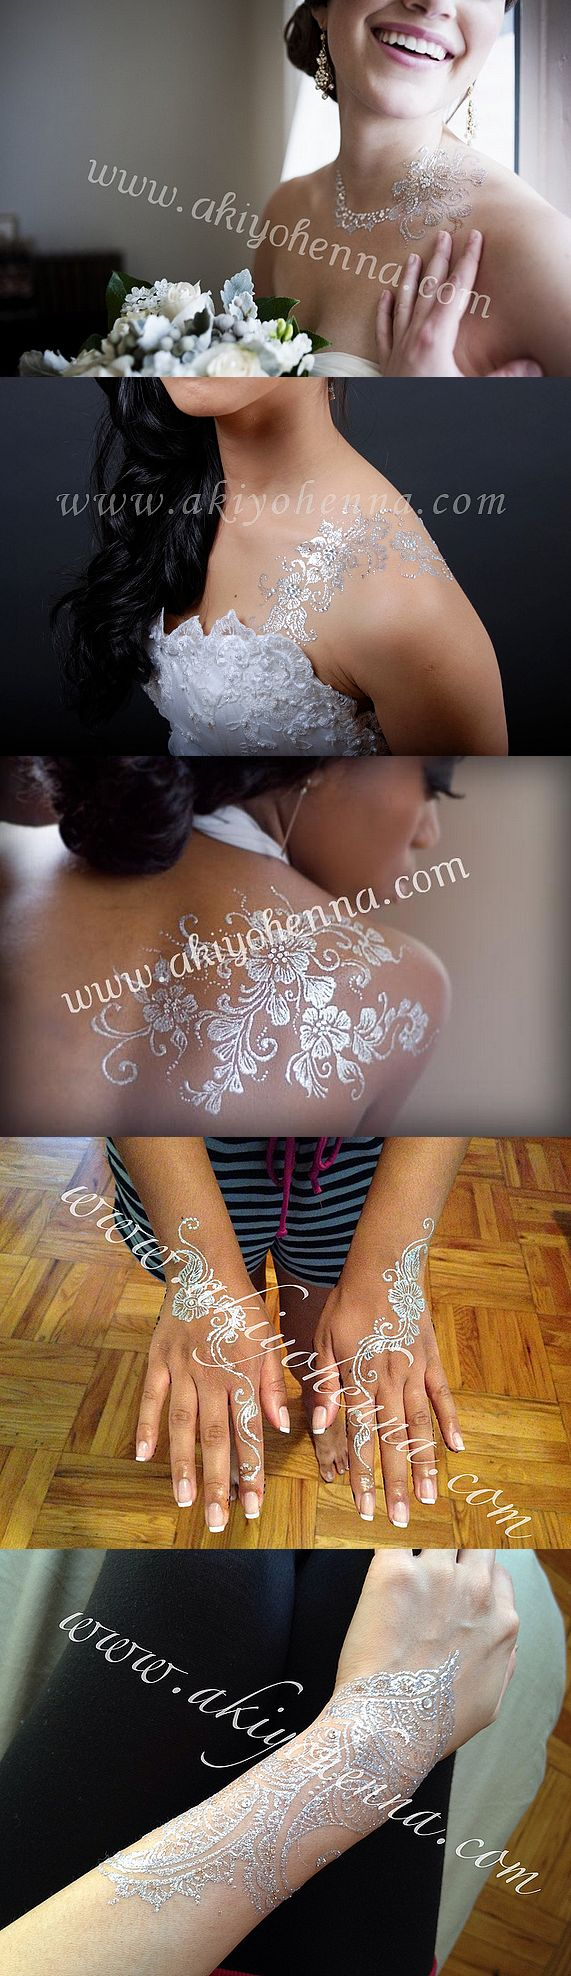 Henna Temporary Tattoo _ Luxe Glow - Bridal & Silver ! Tattoo Wedding <3 by akiyohenna